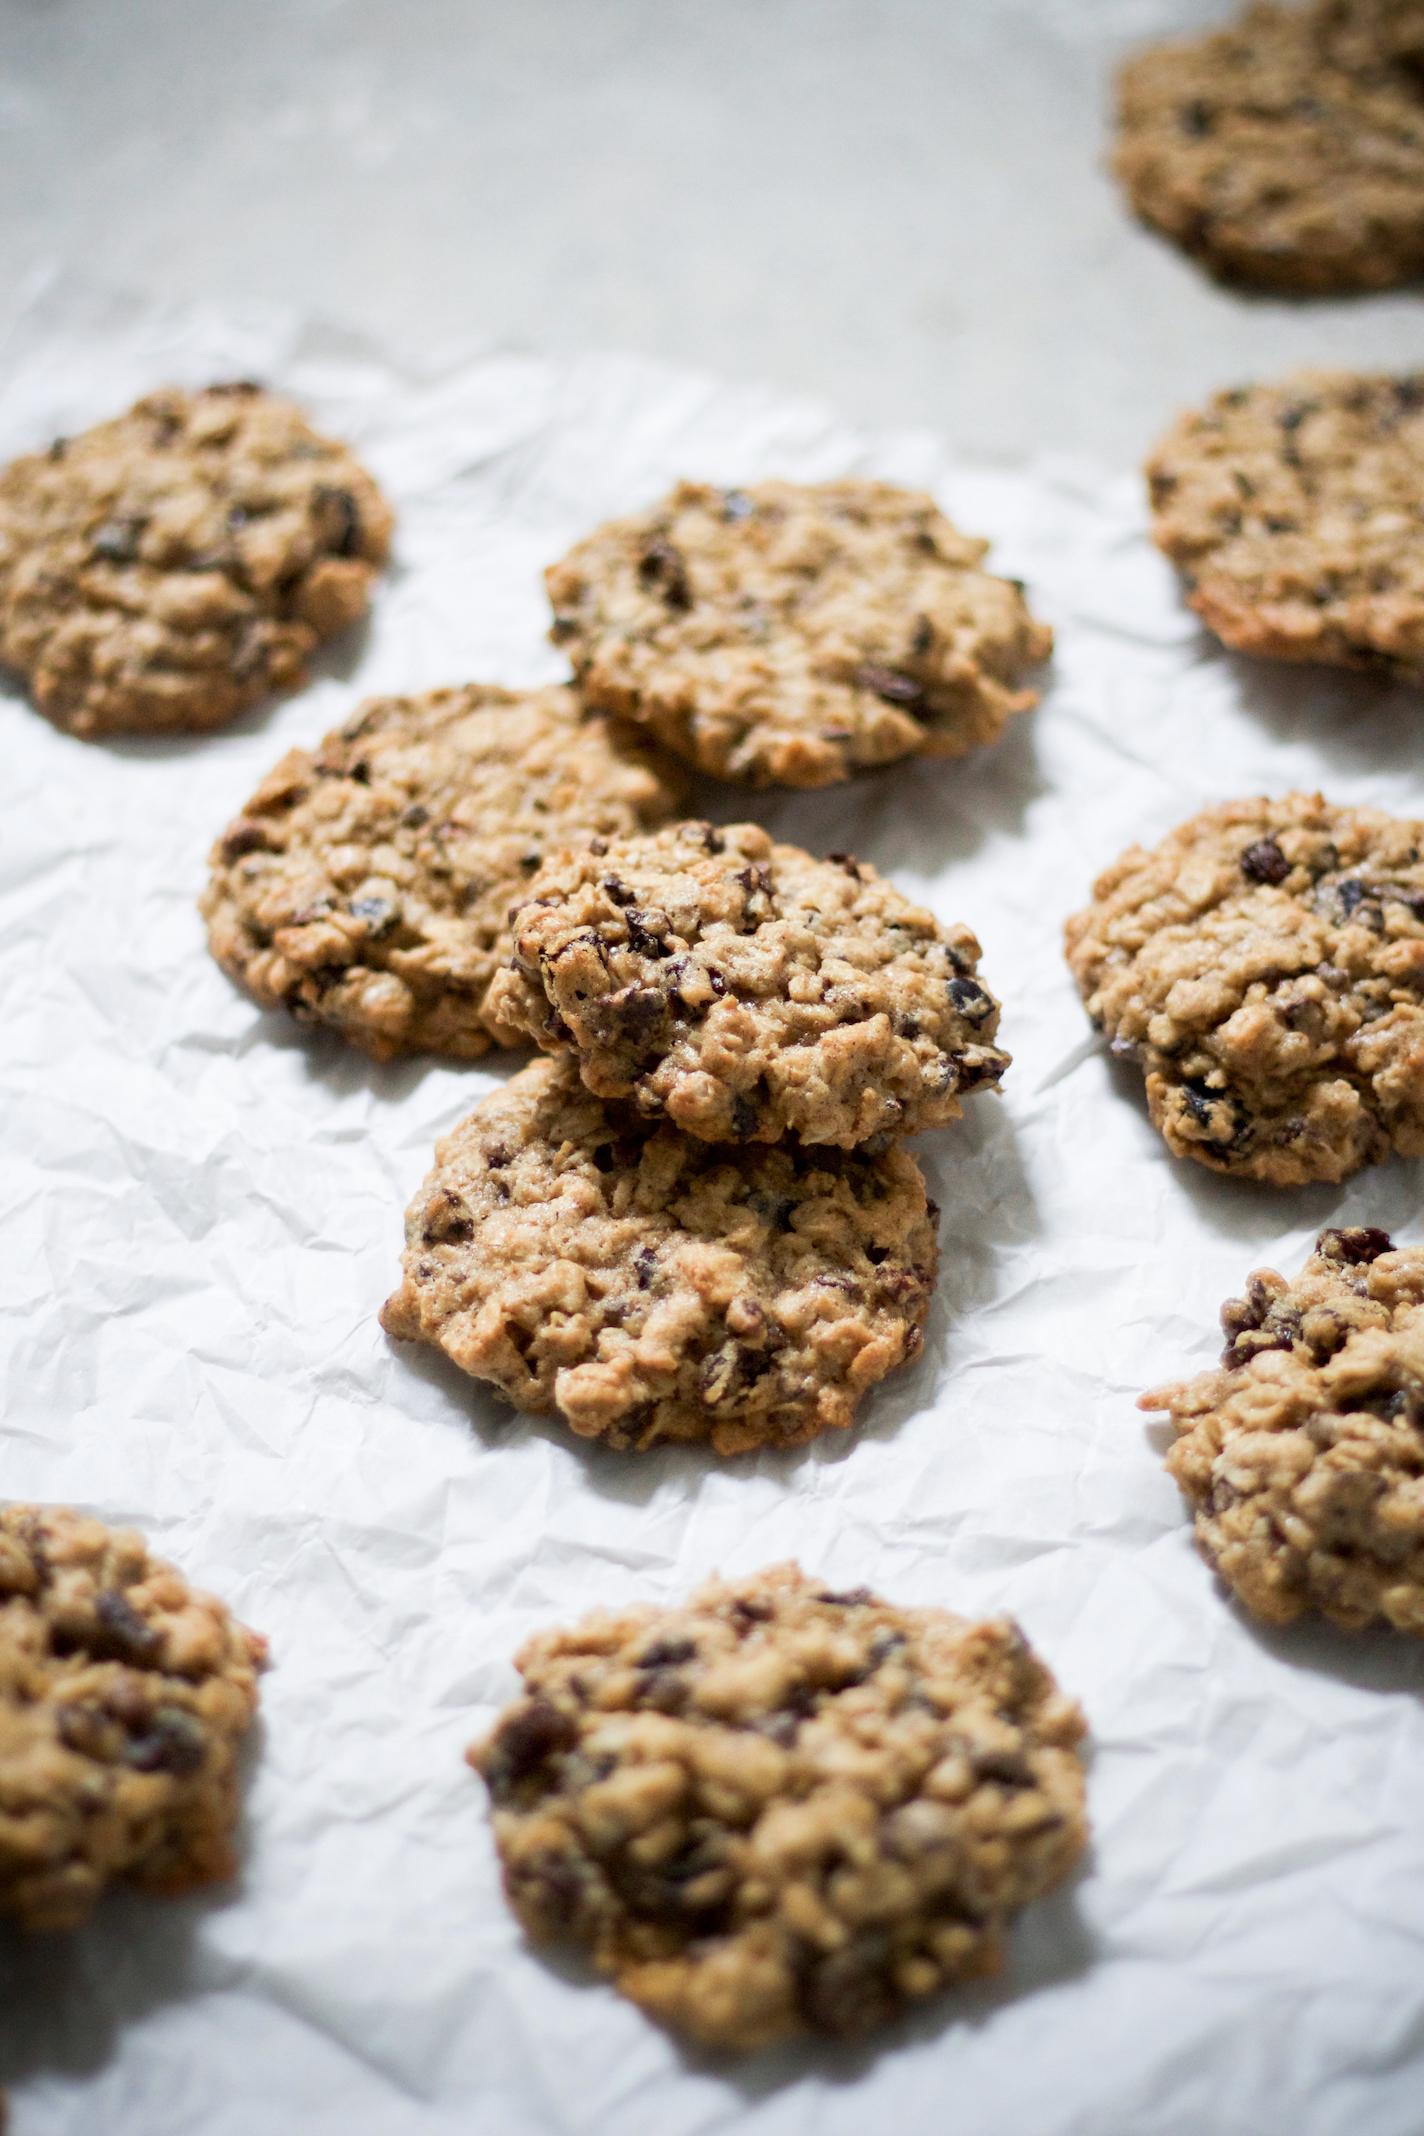 Oatmeal raisin cacao nib cookies 1.jpg